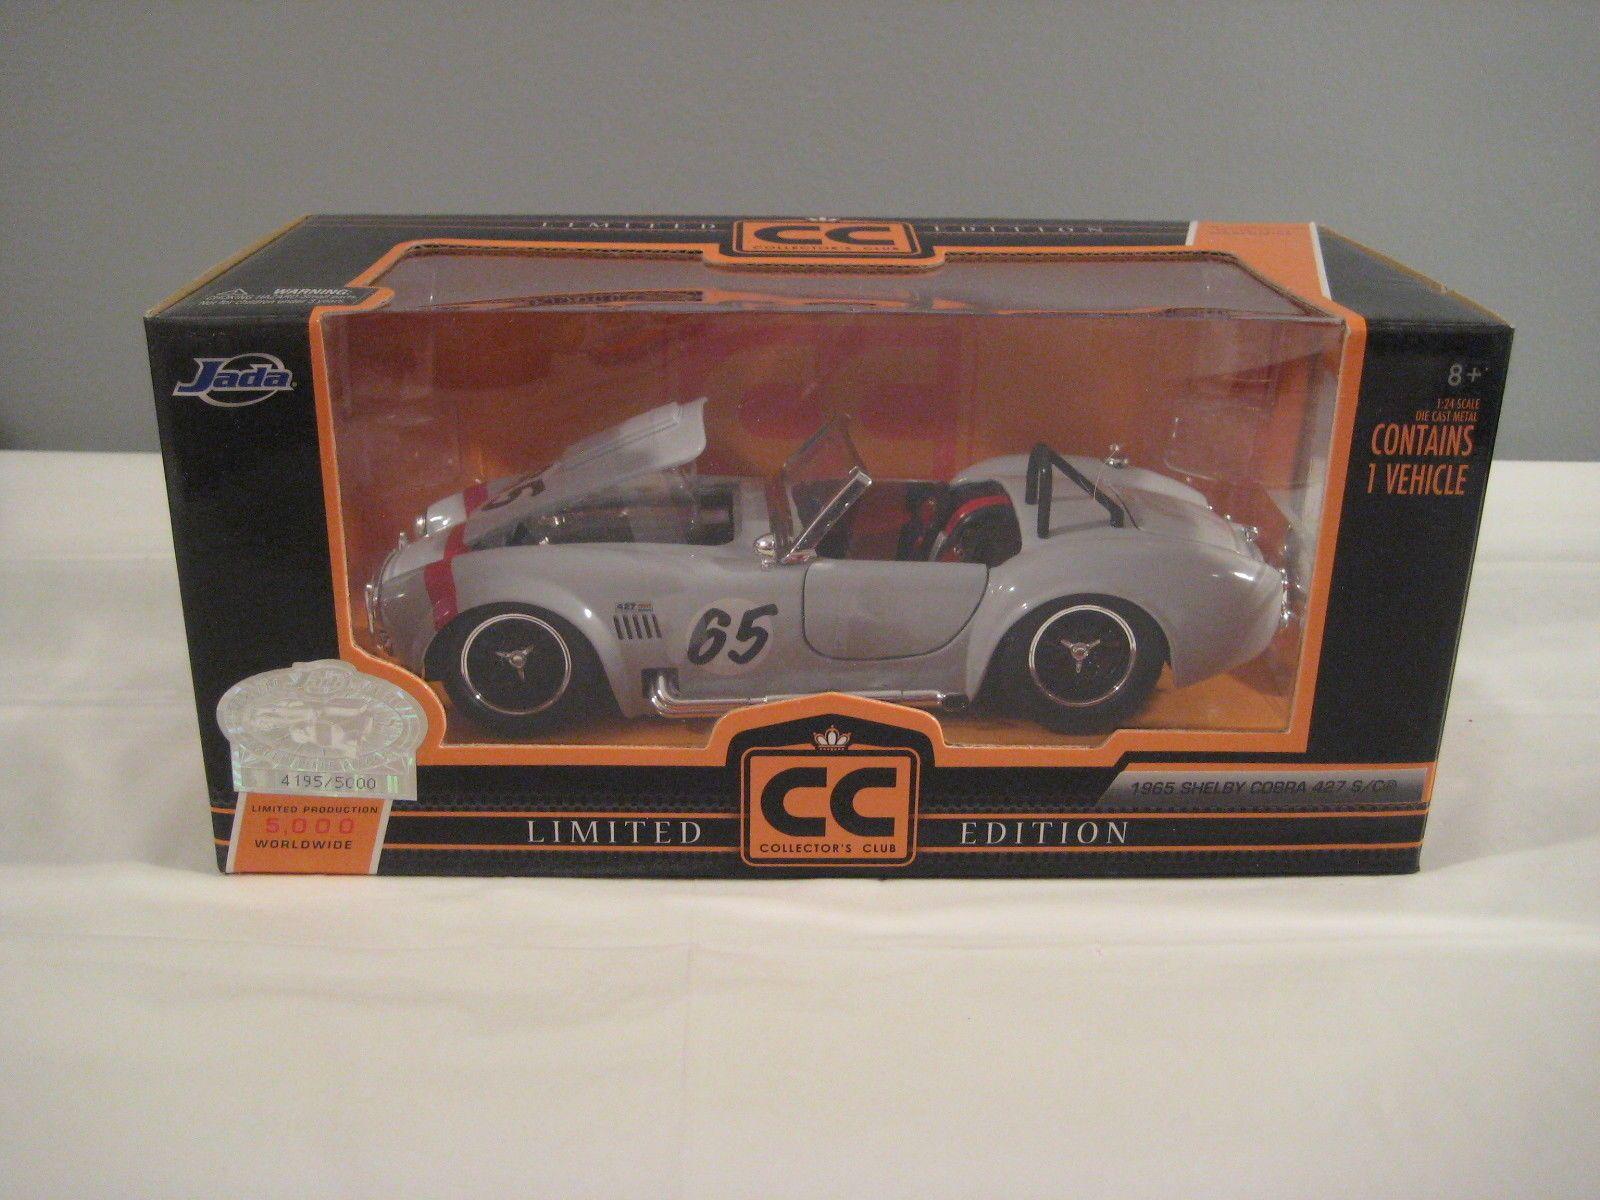 Jada car toys  New Jada Toys Limited Edition Collectorus Club  Shelby Cobra